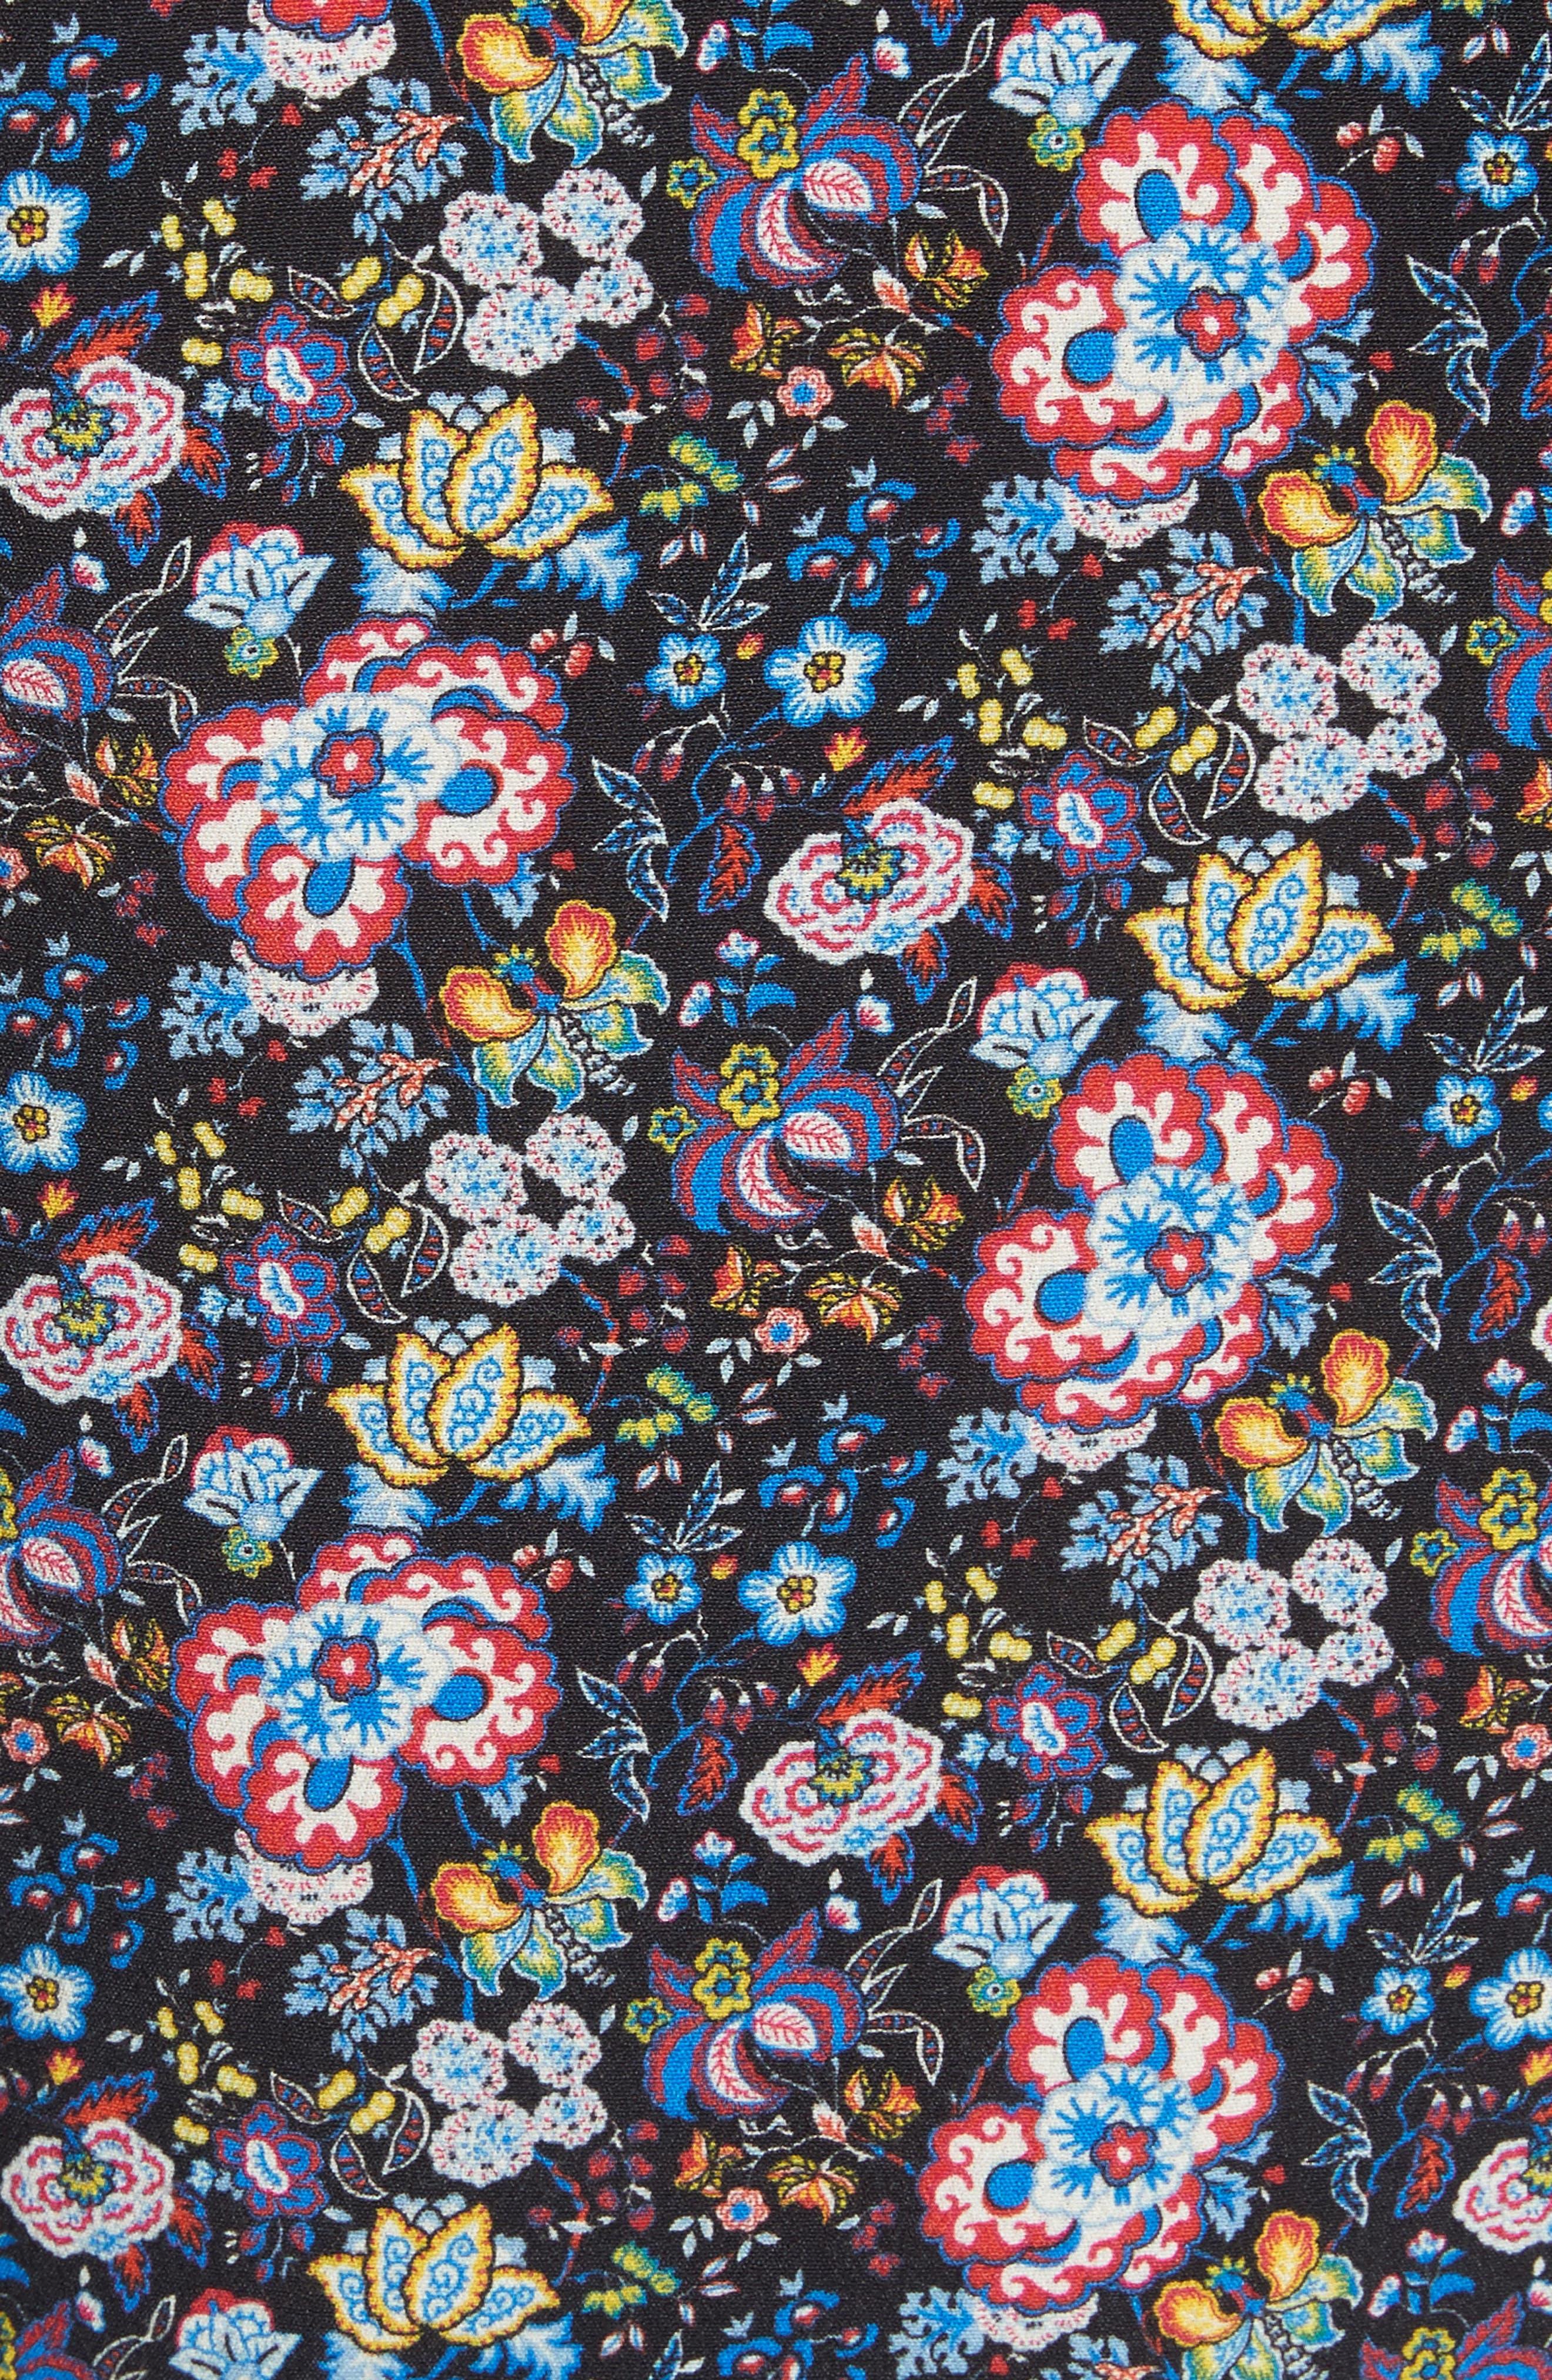 Floral Print One-Shoulder Top,                             Alternate thumbnail 5, color,                             401